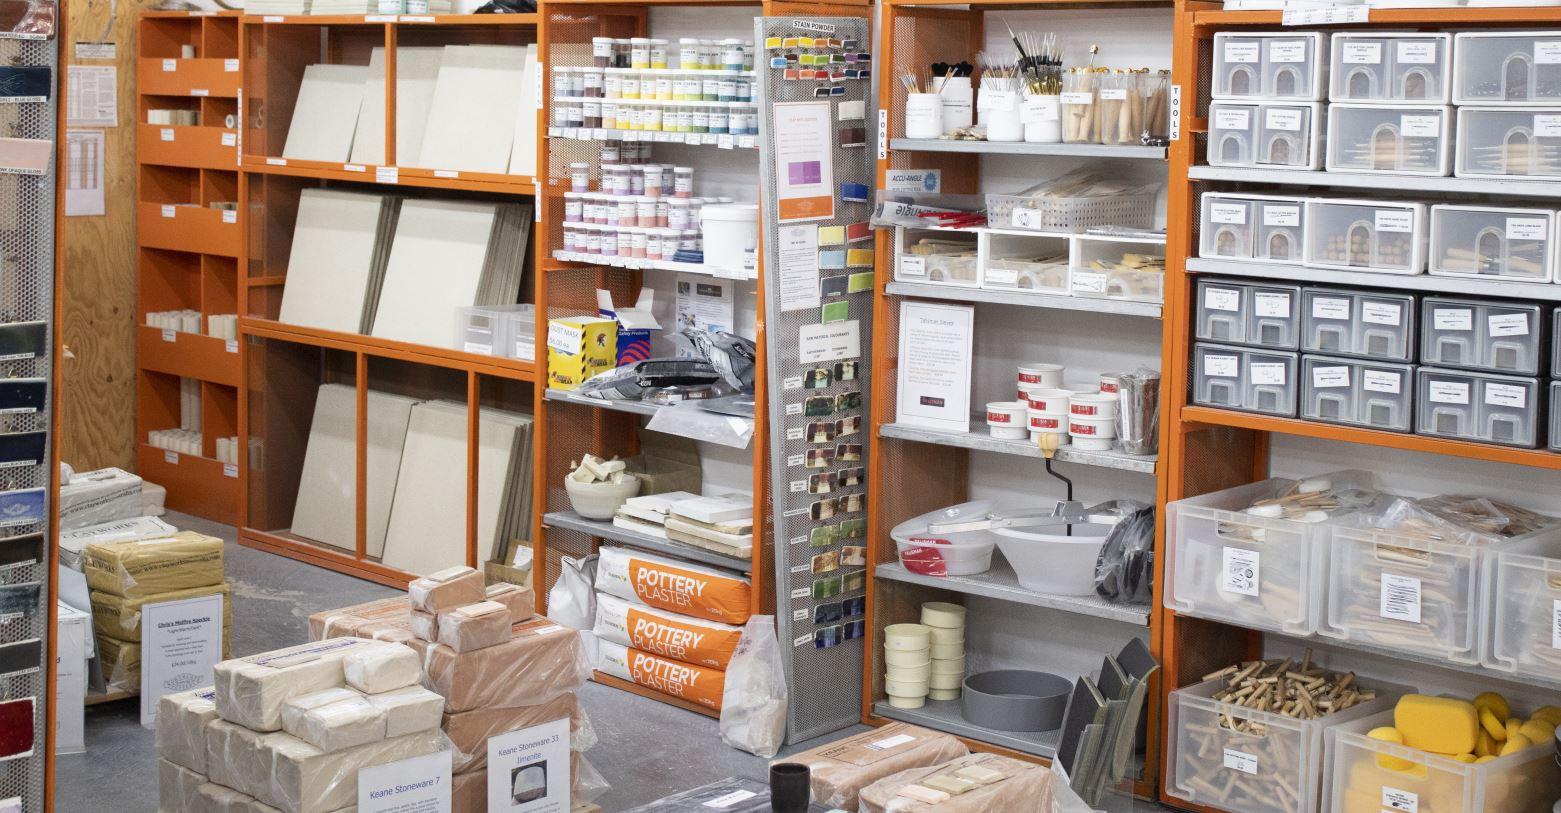 Supplies Store